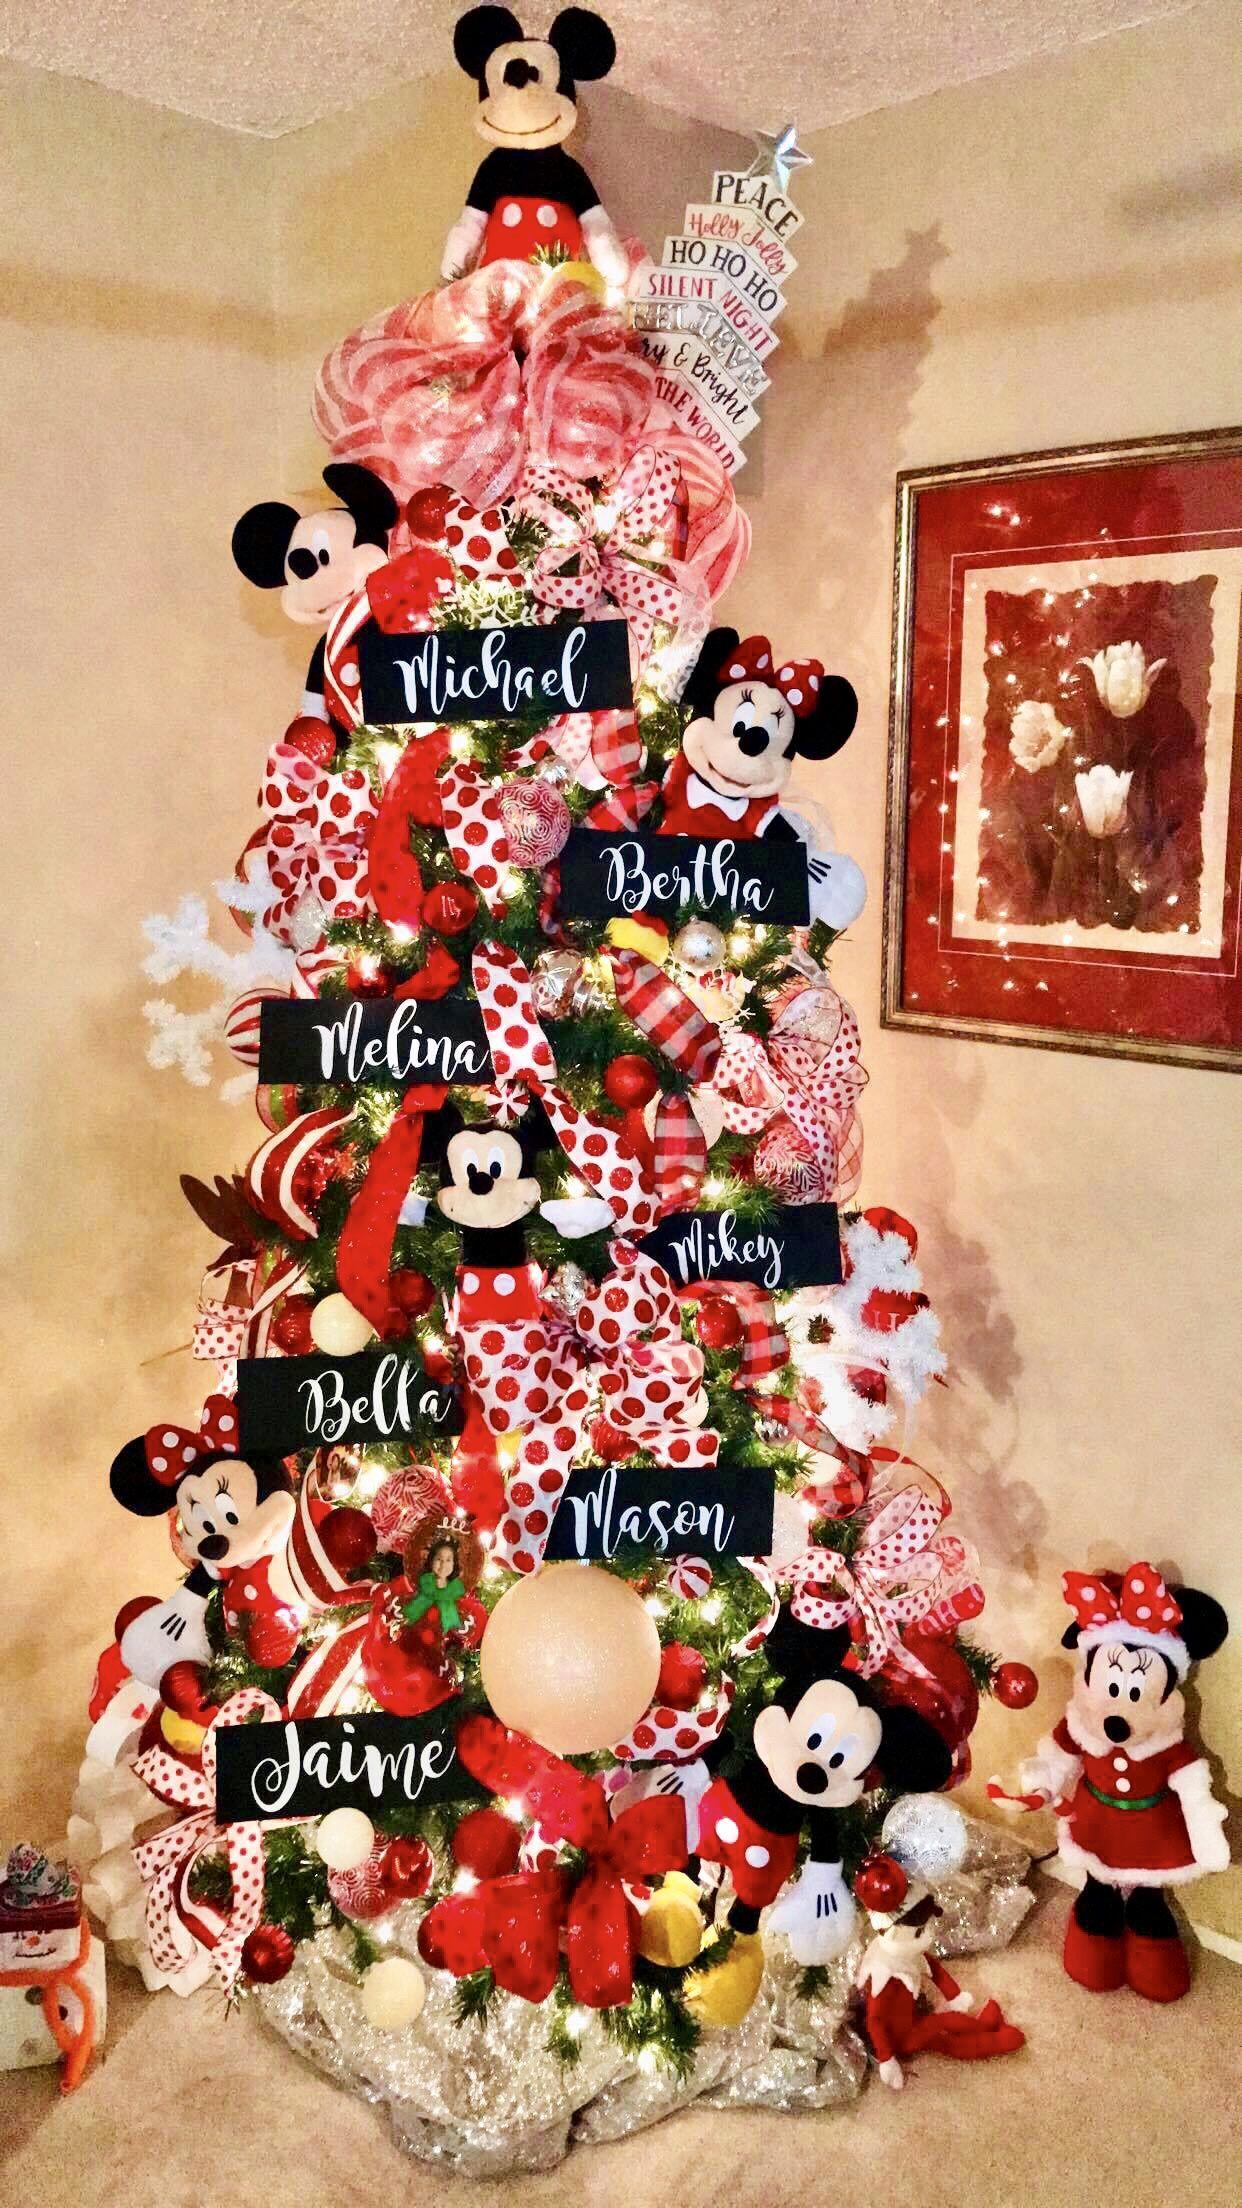 Mickey Minnie Christmas Tree Disney Christmas Tree Disney Christmas Tree Decorations Disney Christmas Decorations